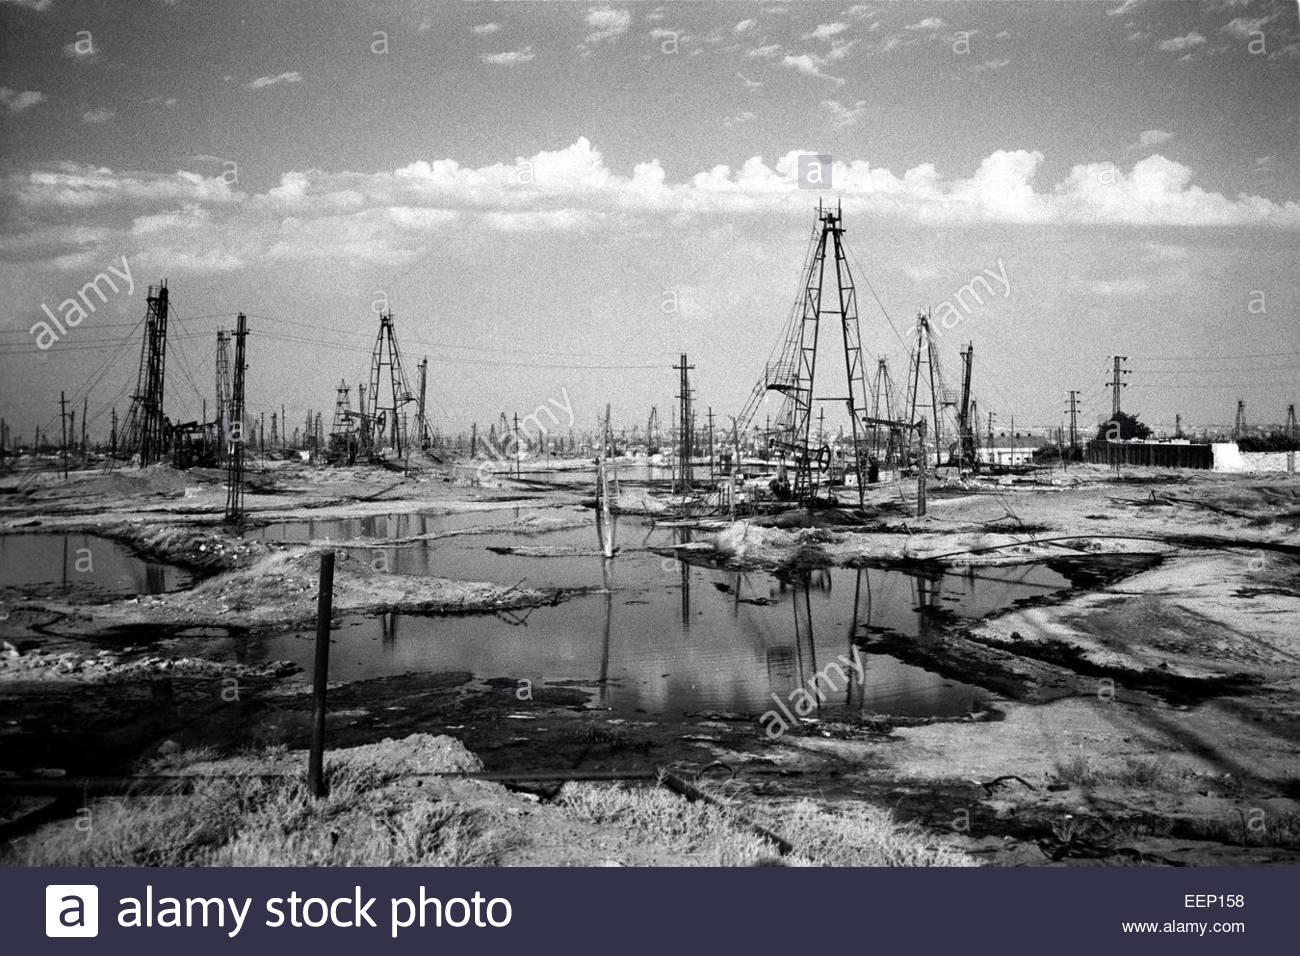 Oil derricks, Baku, Azerbaijan. - Stock Image